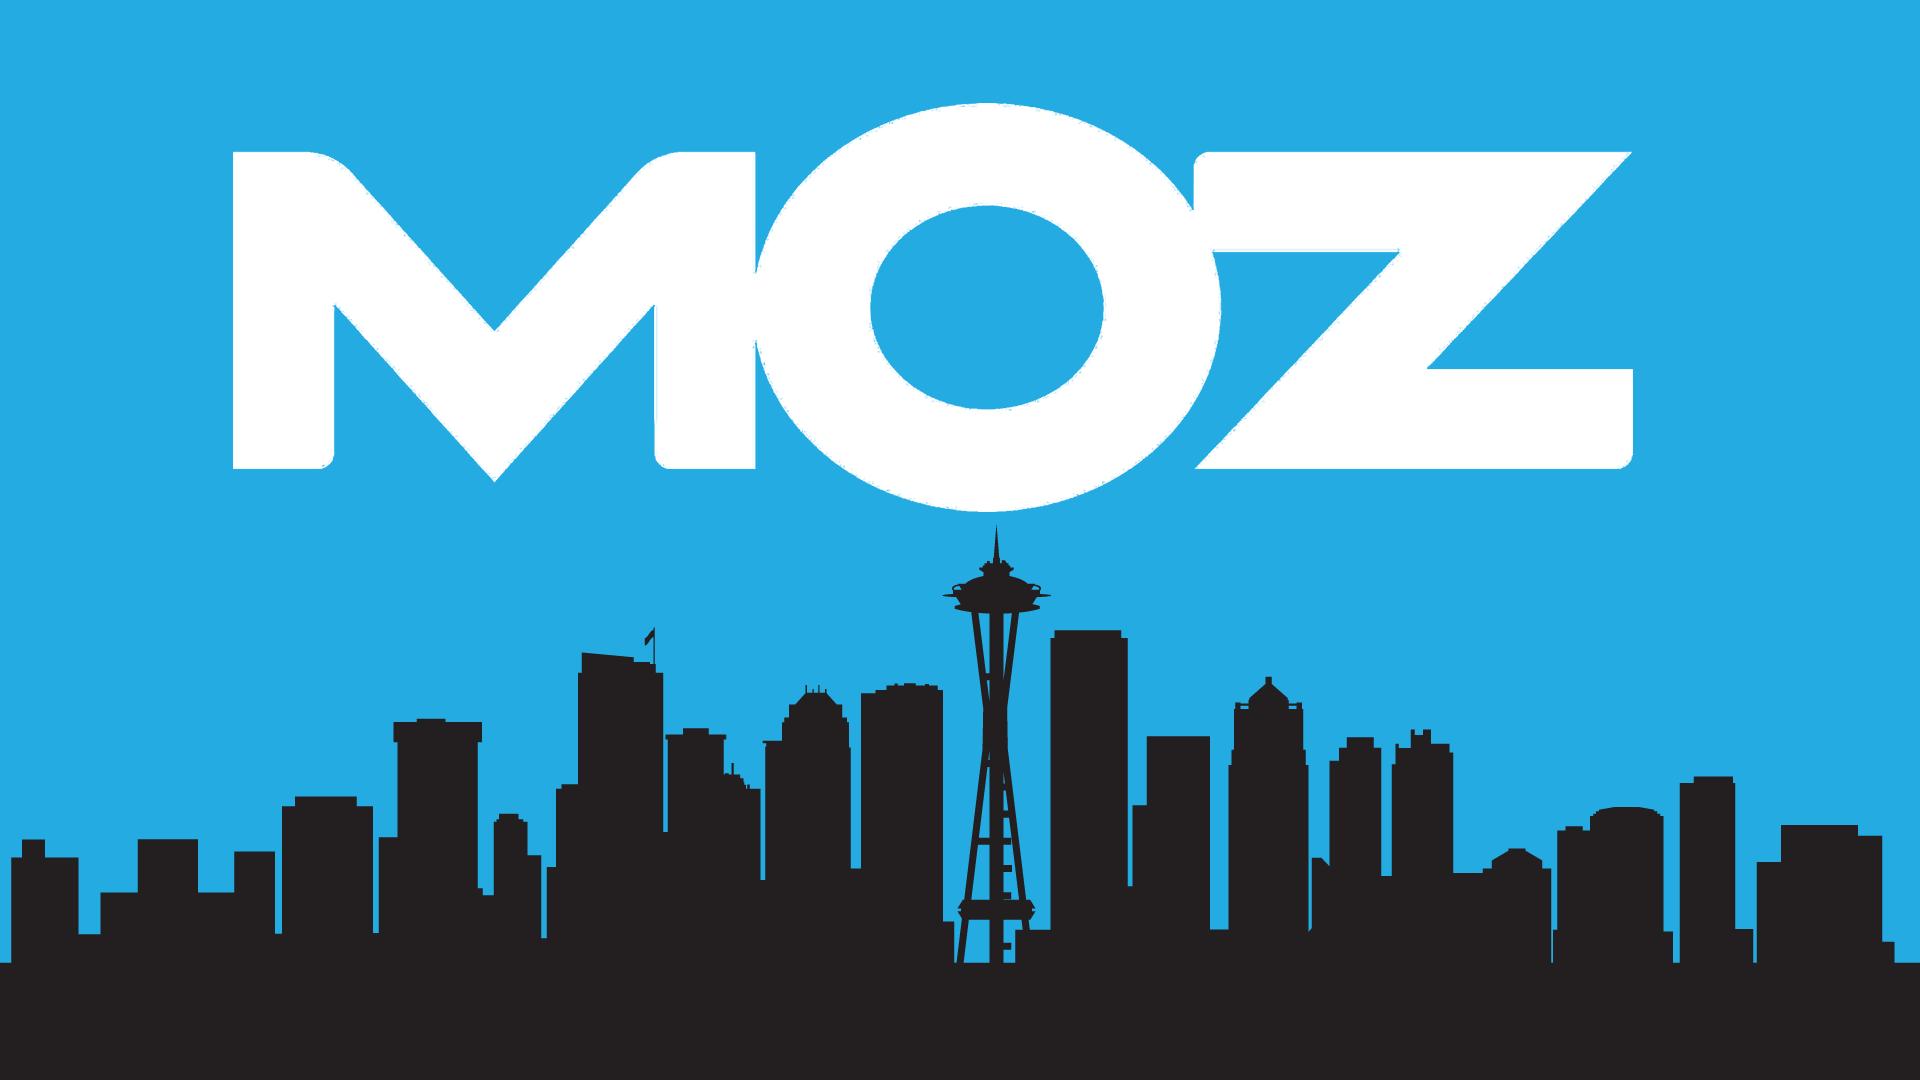 moz-logo-seattle-skyline-ss-1920.png